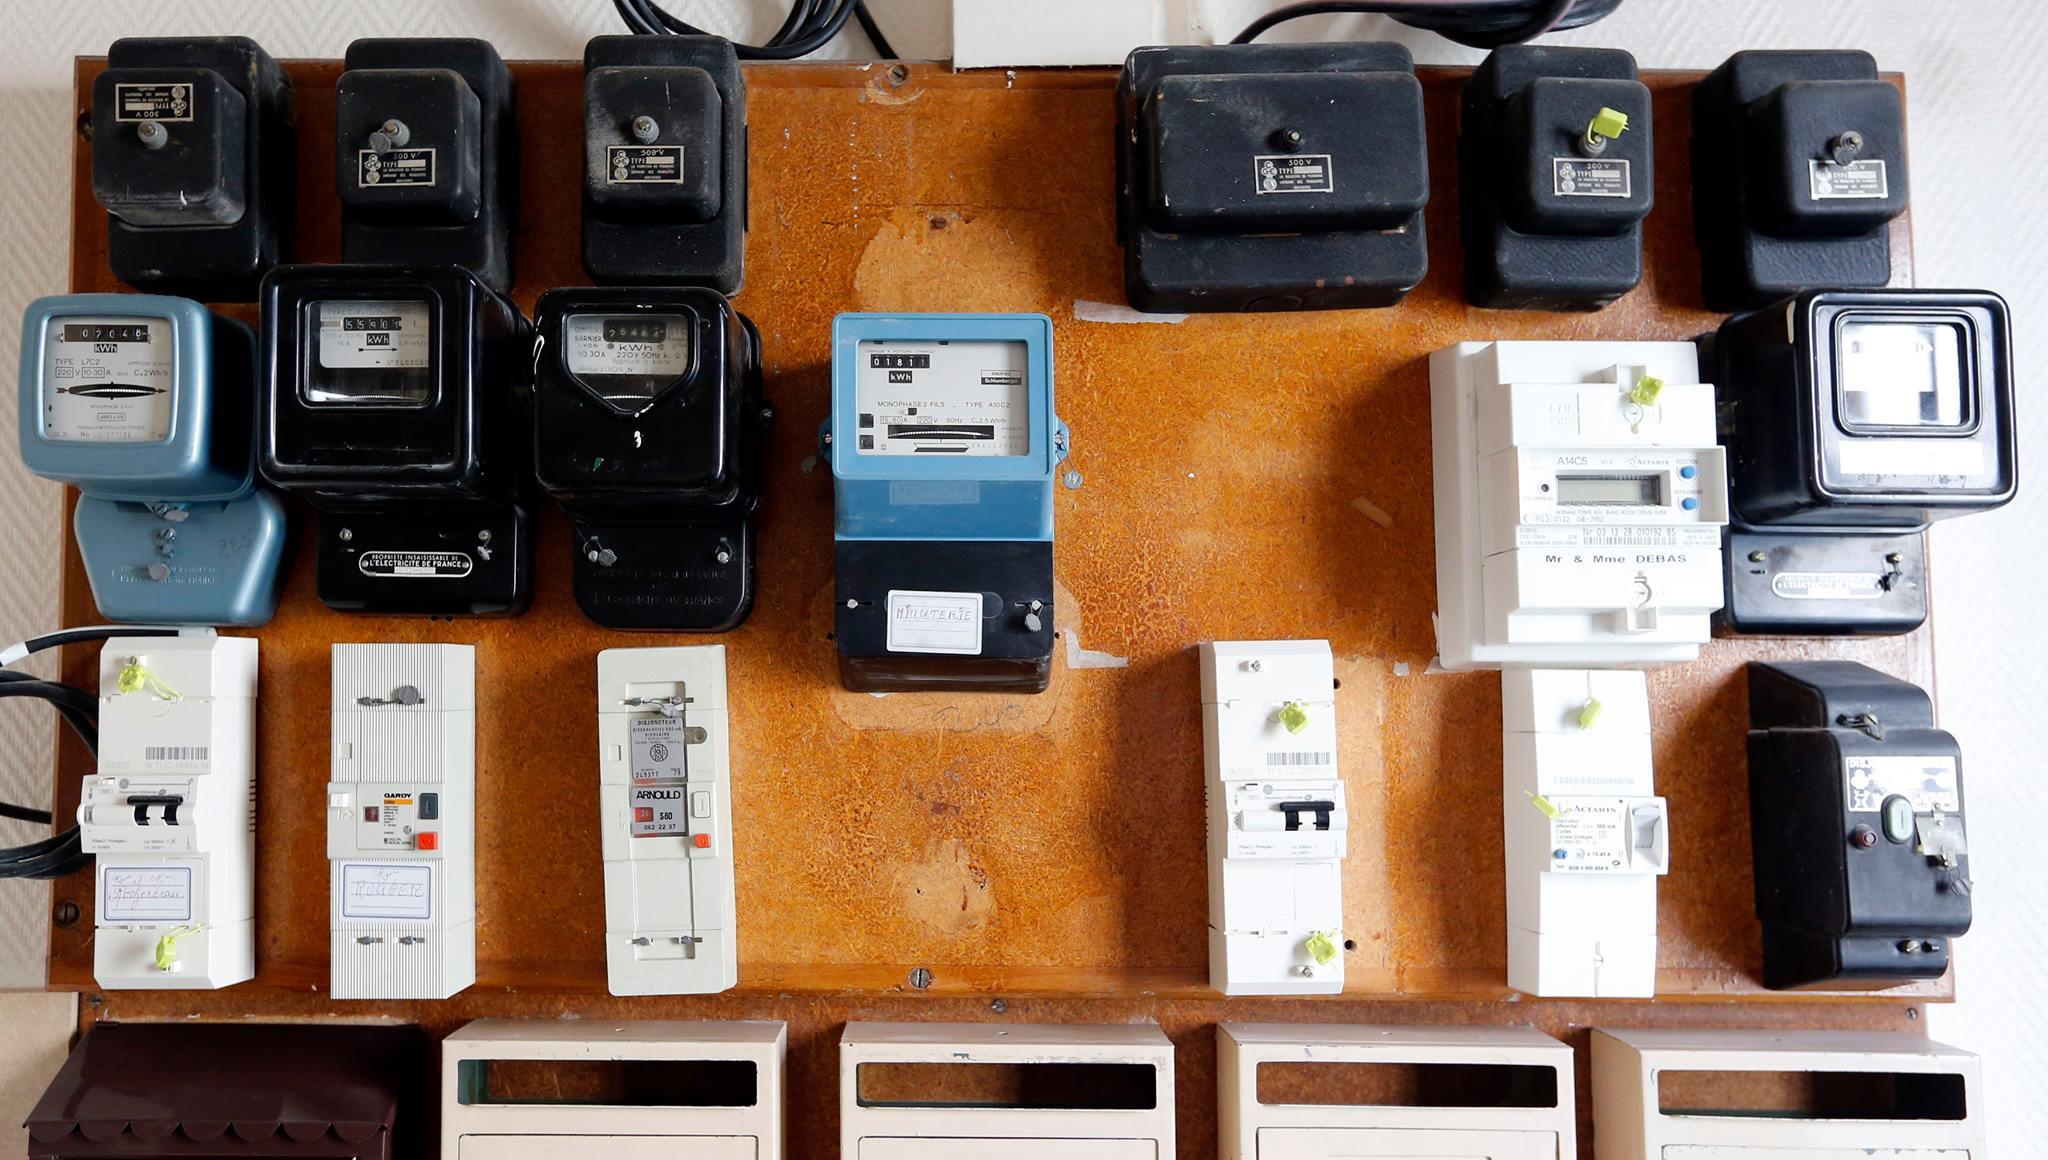 Photo of «كهرباء دمشق»: نسبة الخطأ لا تتعدى 5 بالألف في الدورة … مواطنون عدّاداتهم صفر وآخرون قد يدفعون لغيرهم!